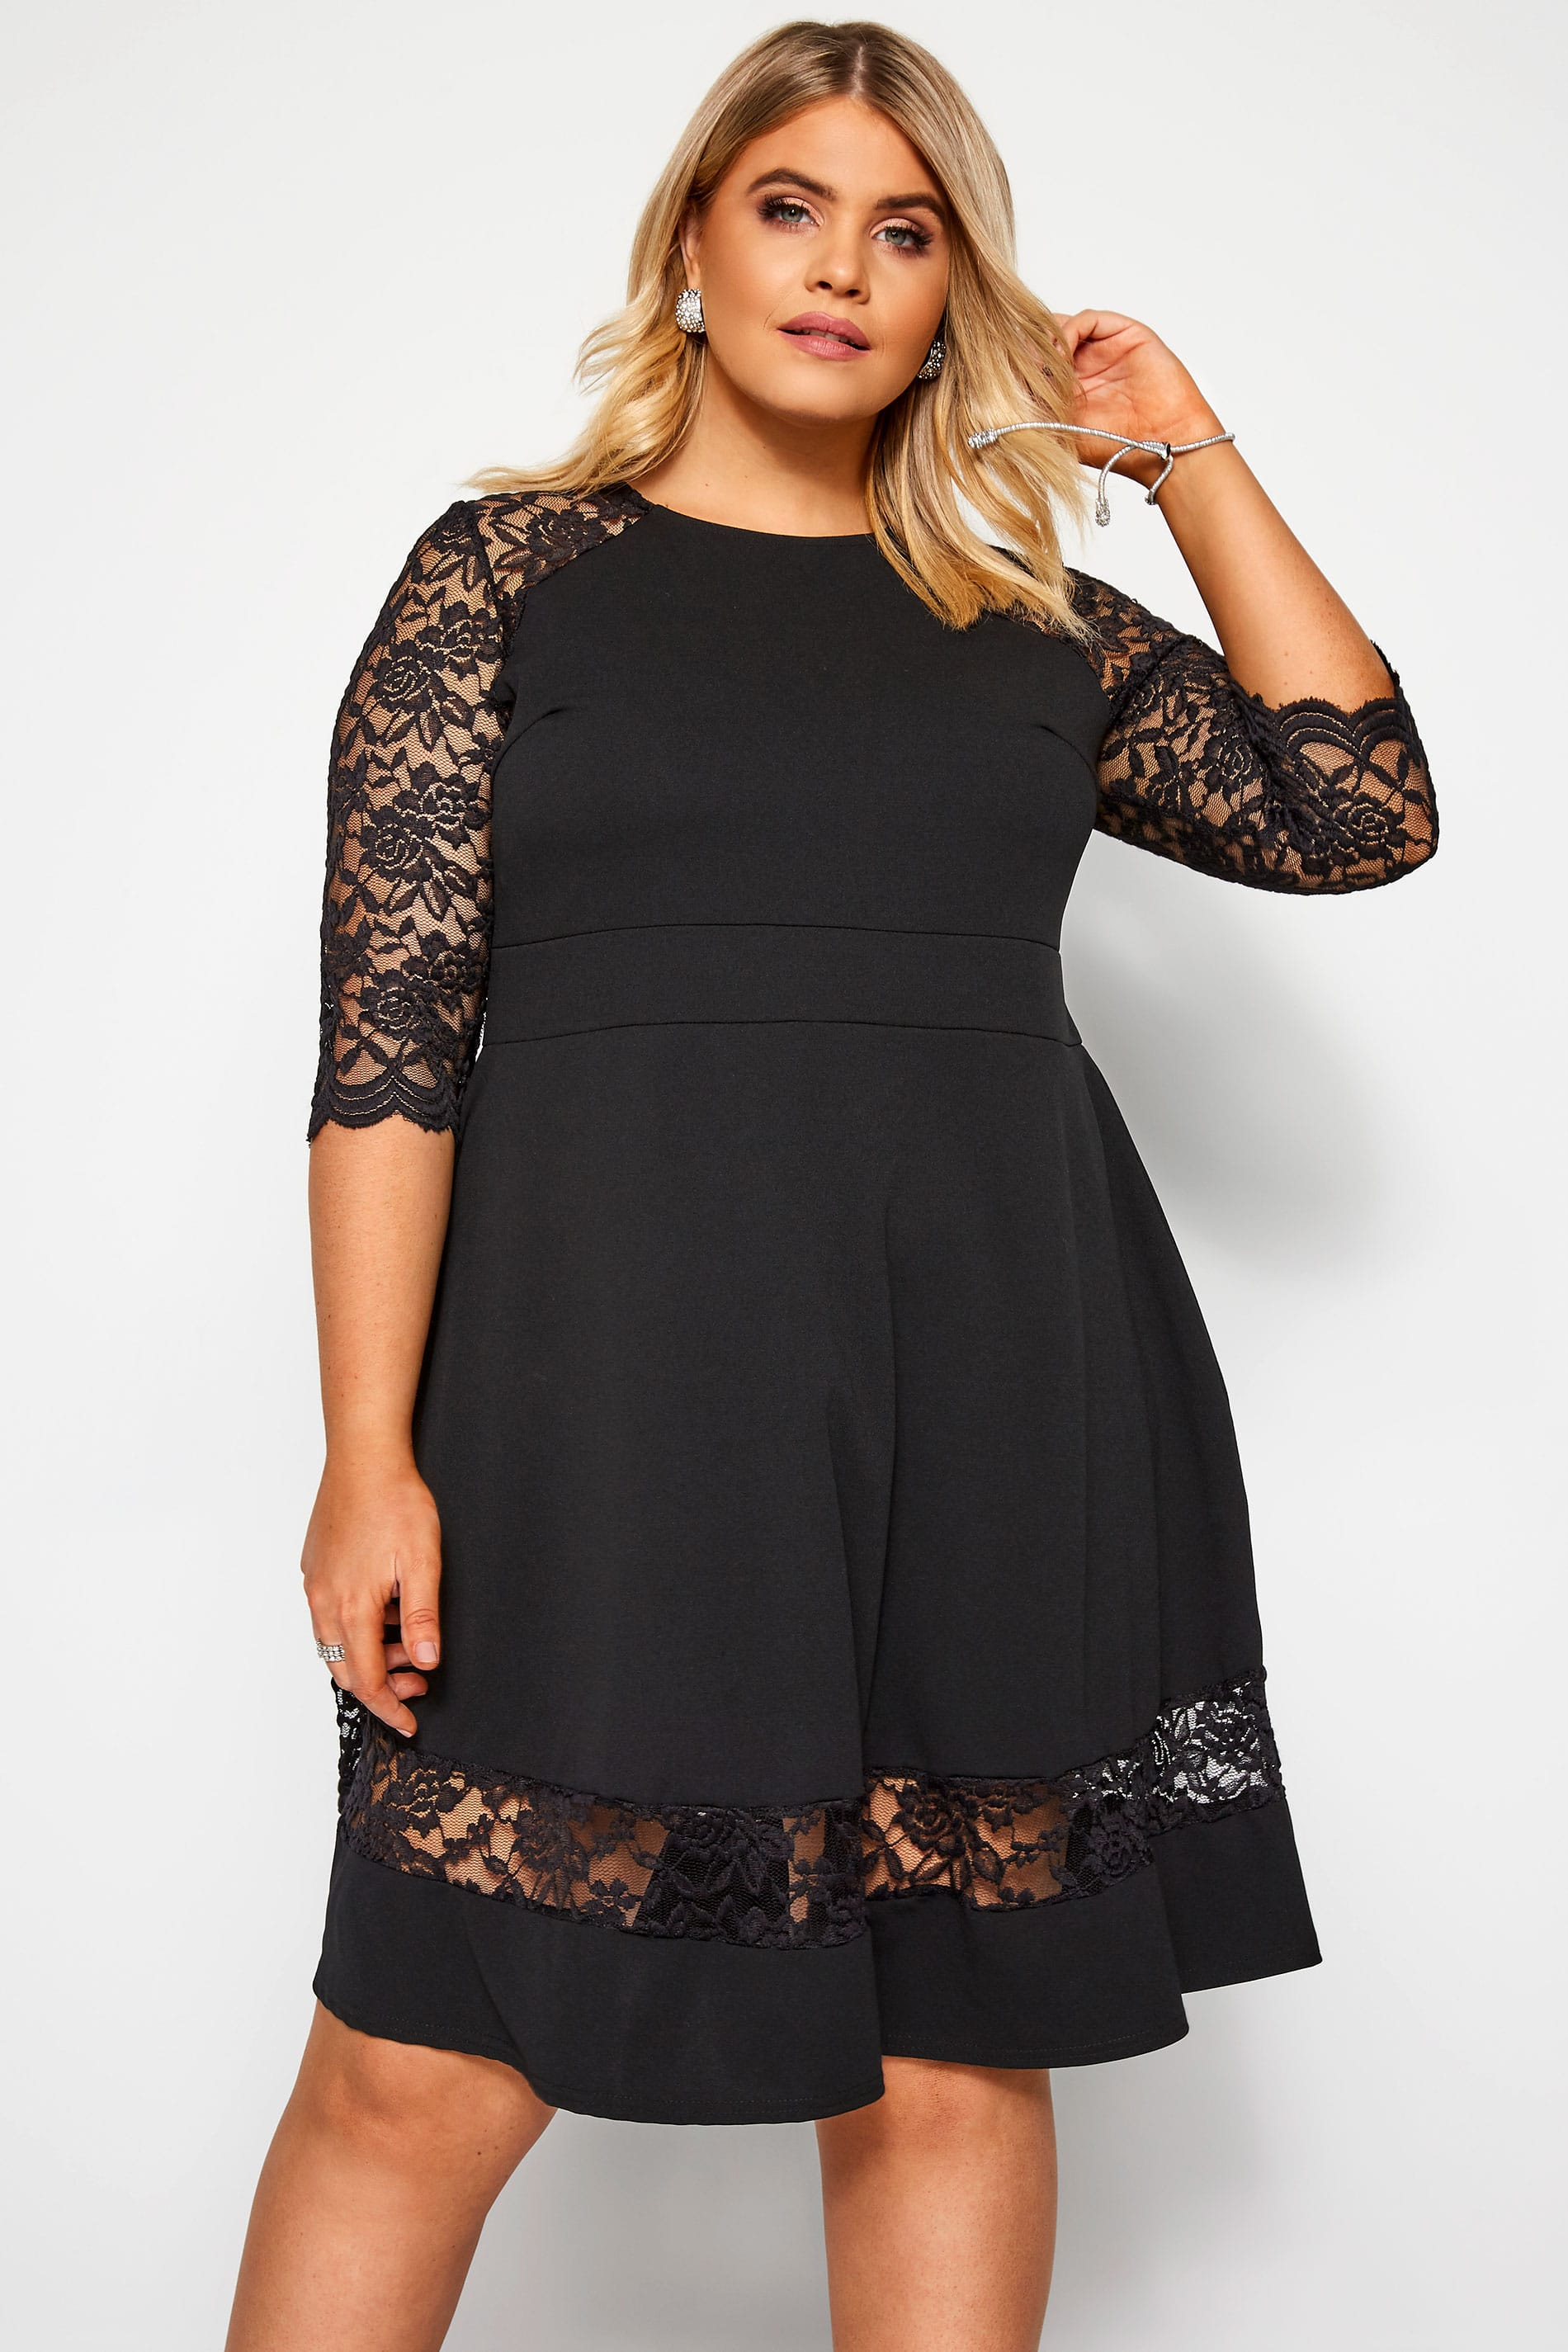 YOURS LONDON Black Lace Skater Dress